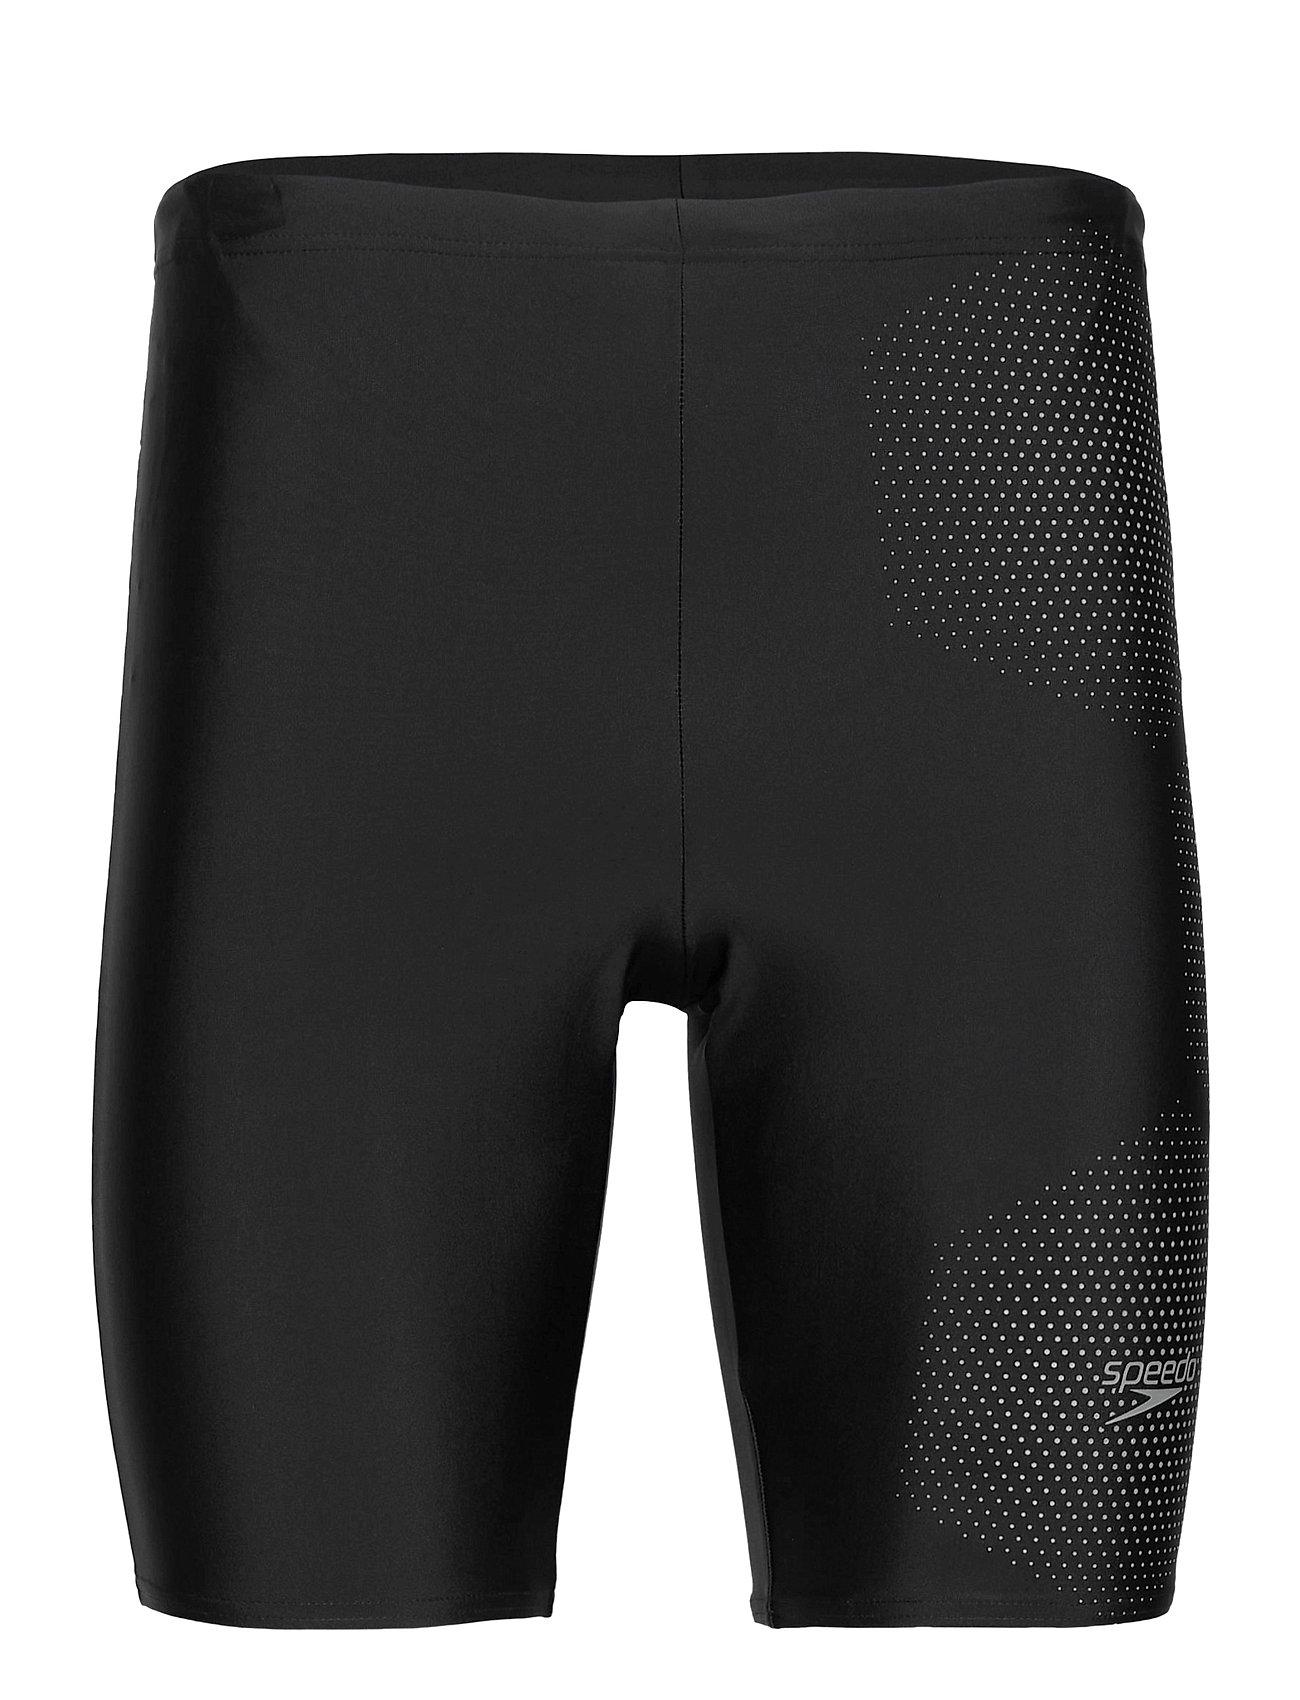 Image of Speedo Gala Logo Jammer Am Black/Blue 1 Swimwear Briefs & Speedos Sort Speedo (3493872573)